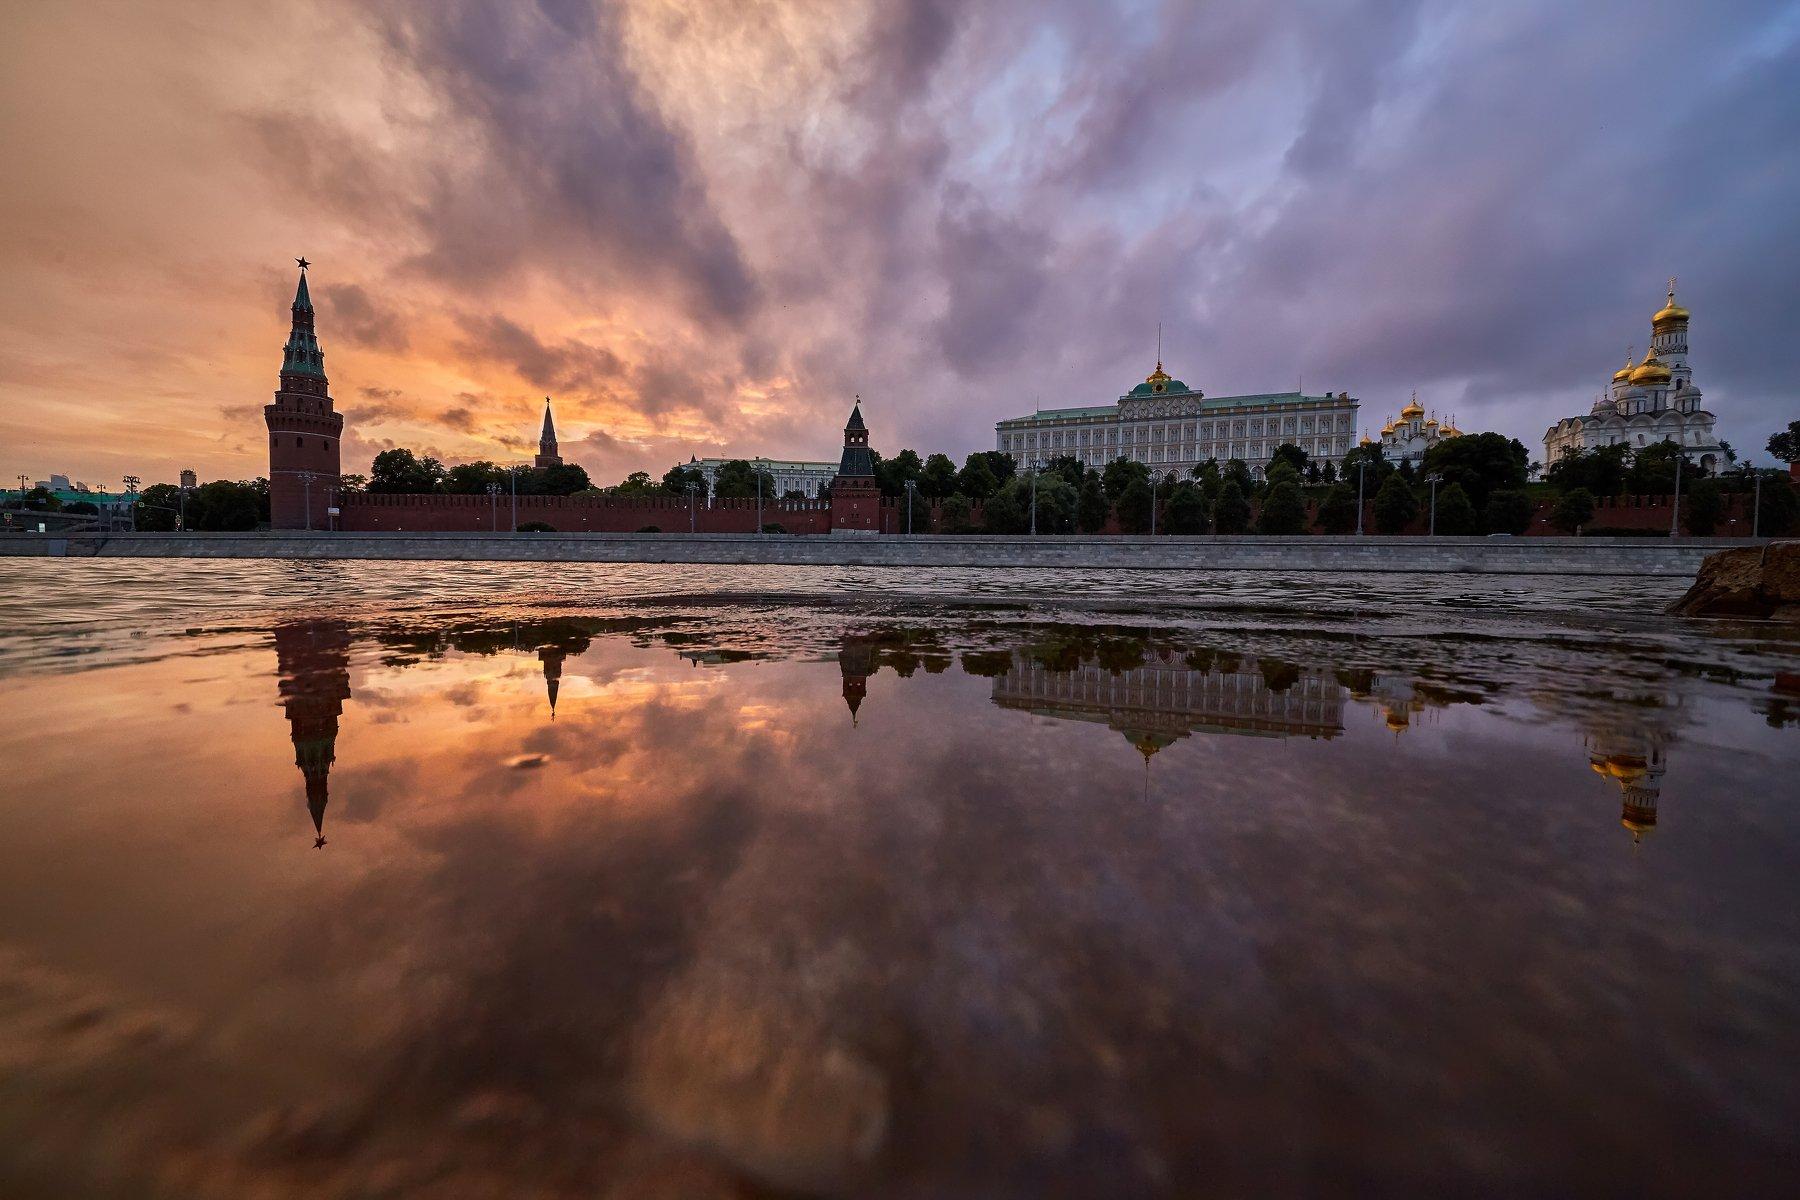 город, Москва, архитектура, закат, небо, облака, тучи, красота , Конев Сергей